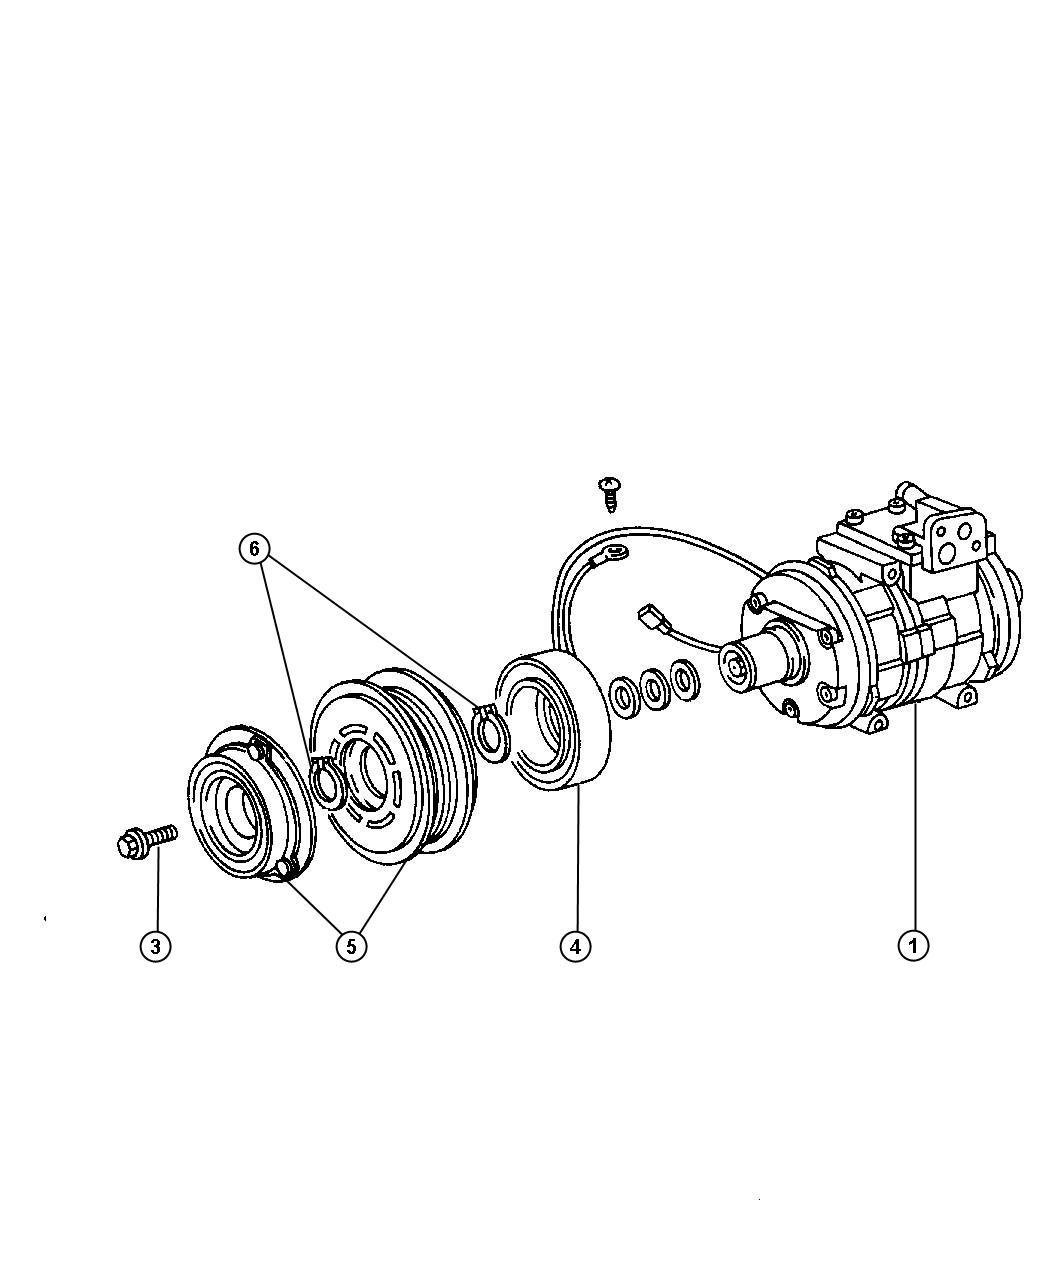 Chrysler Aspen Coil Air Conditioning Clutch